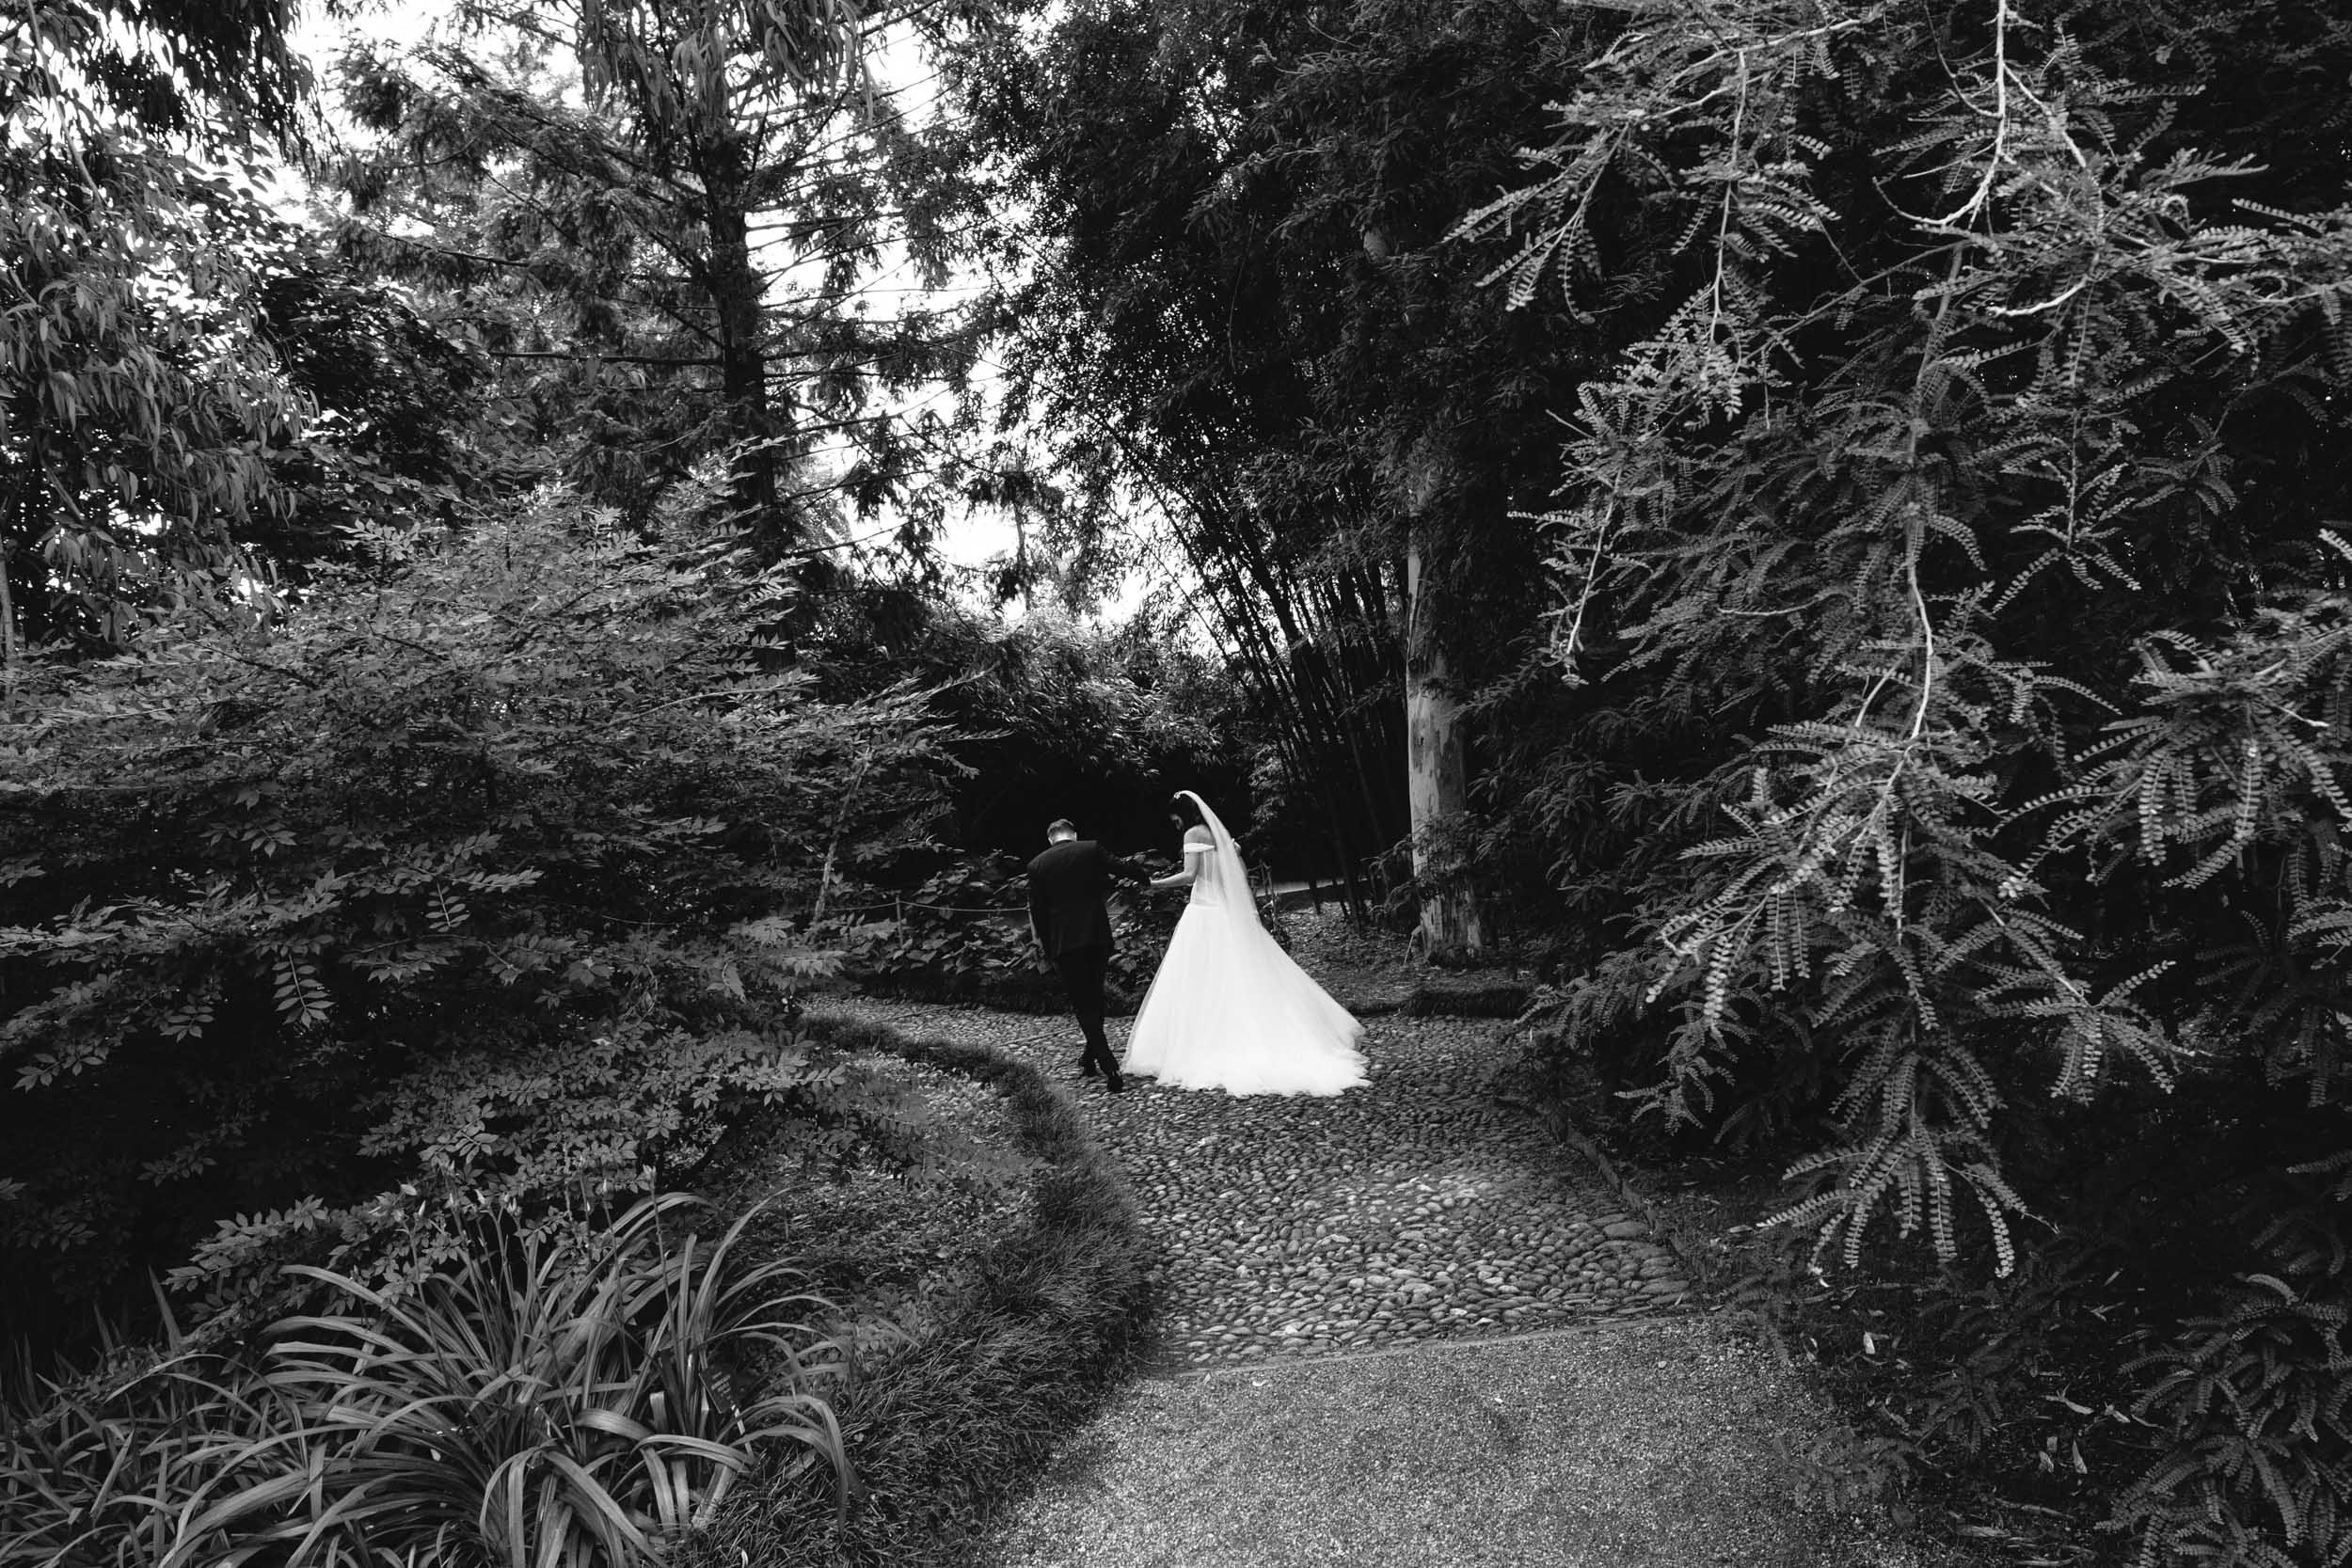 olivia-andreas-wedding-switzerland-329.jpg